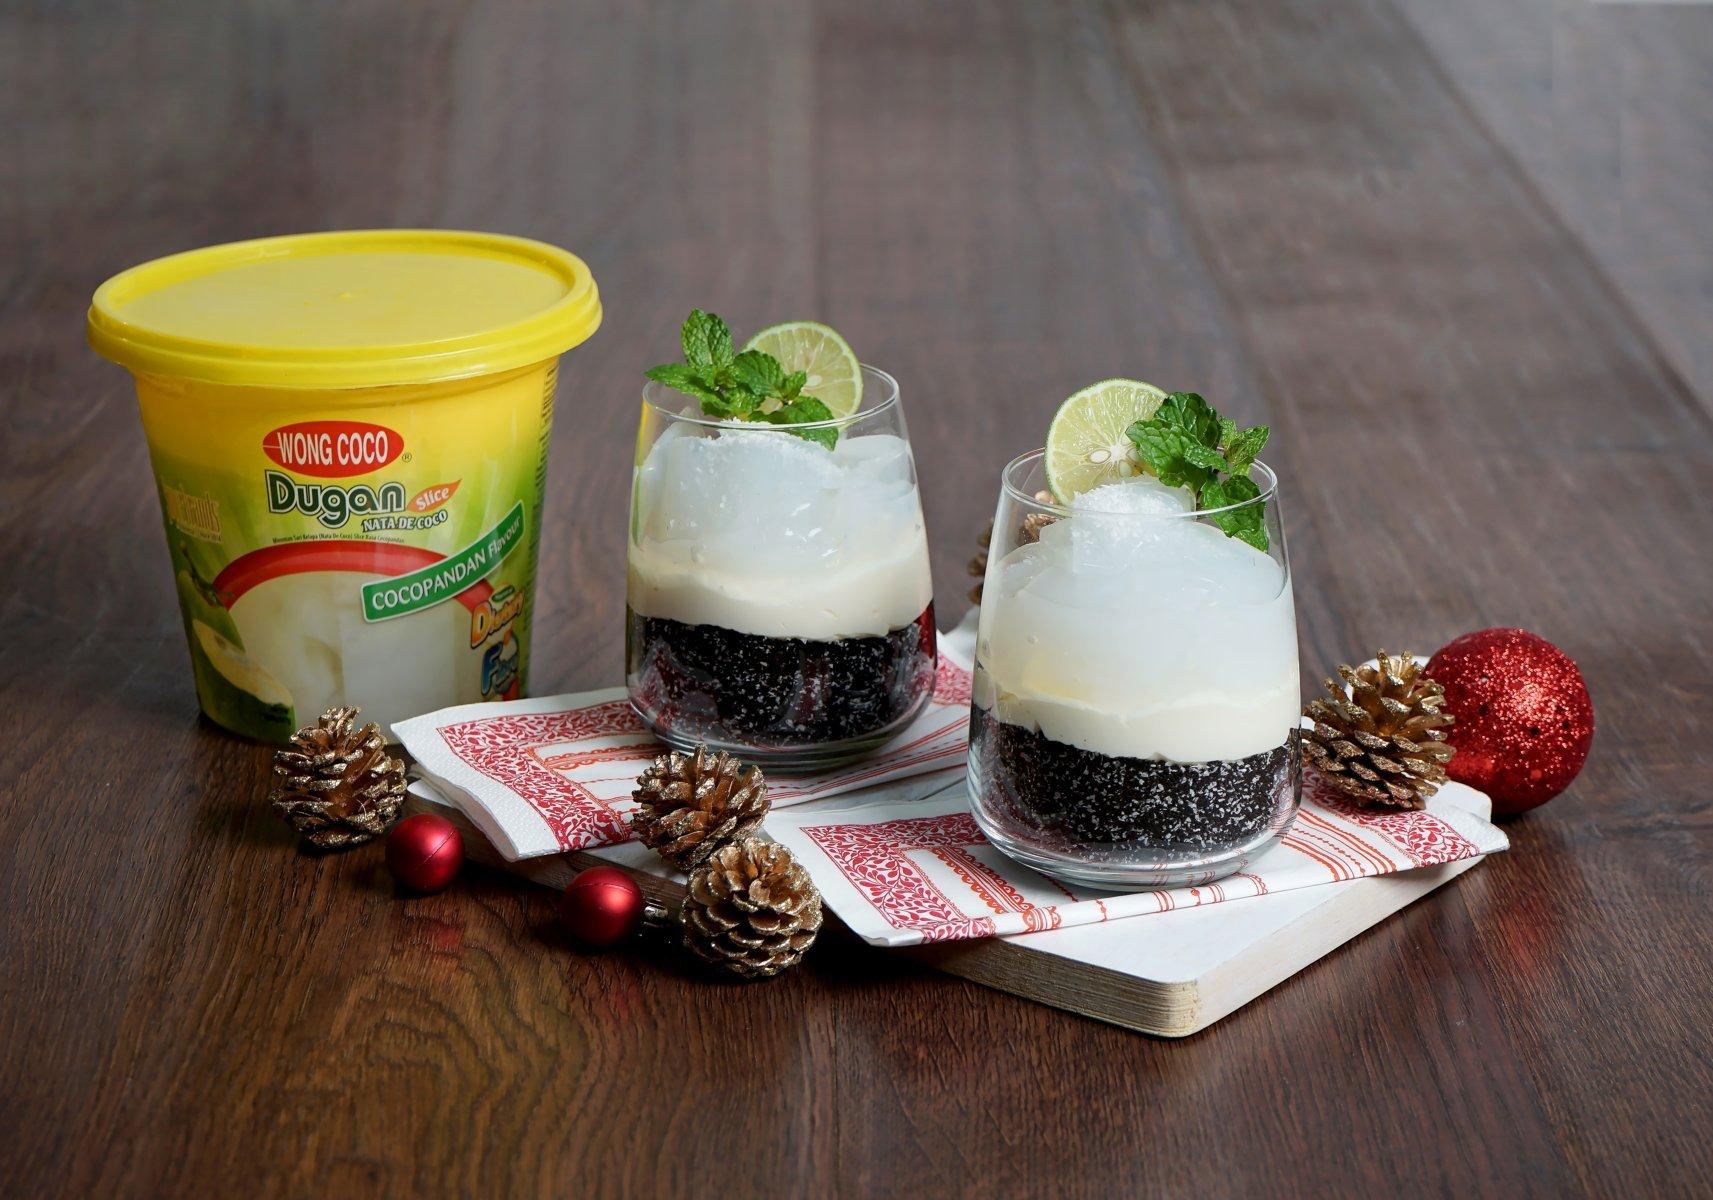 Coconut Cheese & Wong Coco Dugan